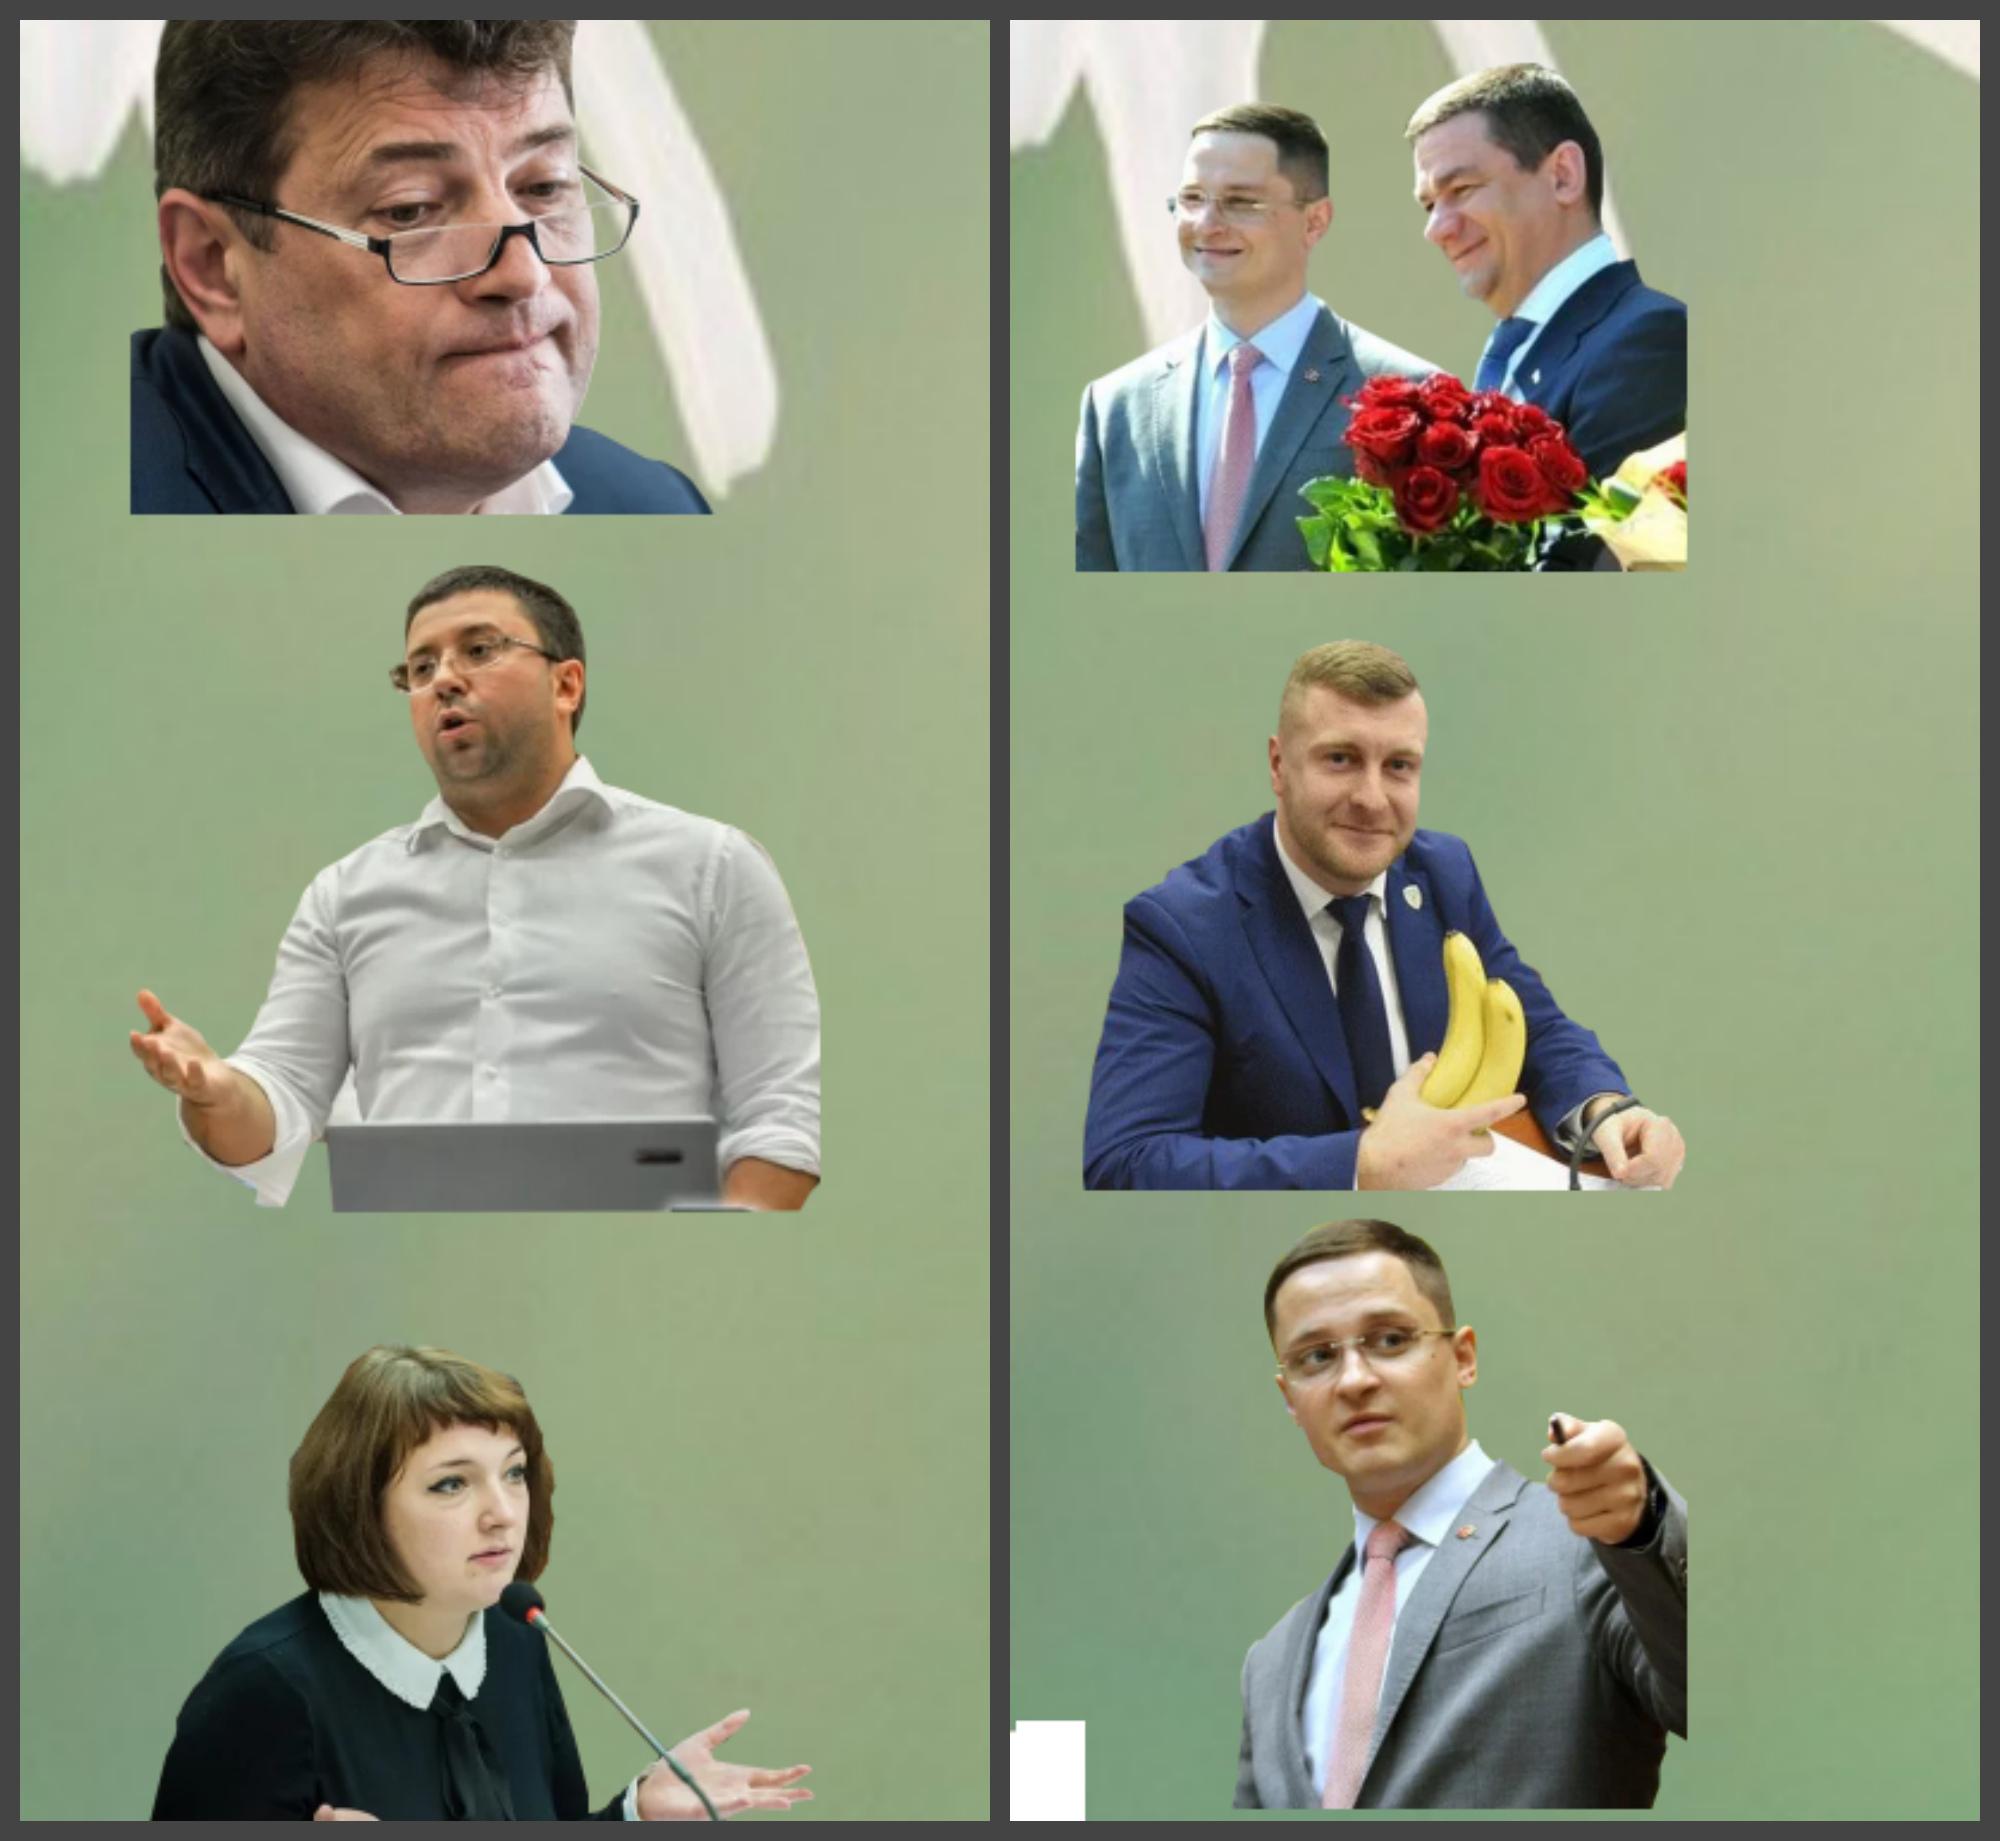 novyiy-kollazh